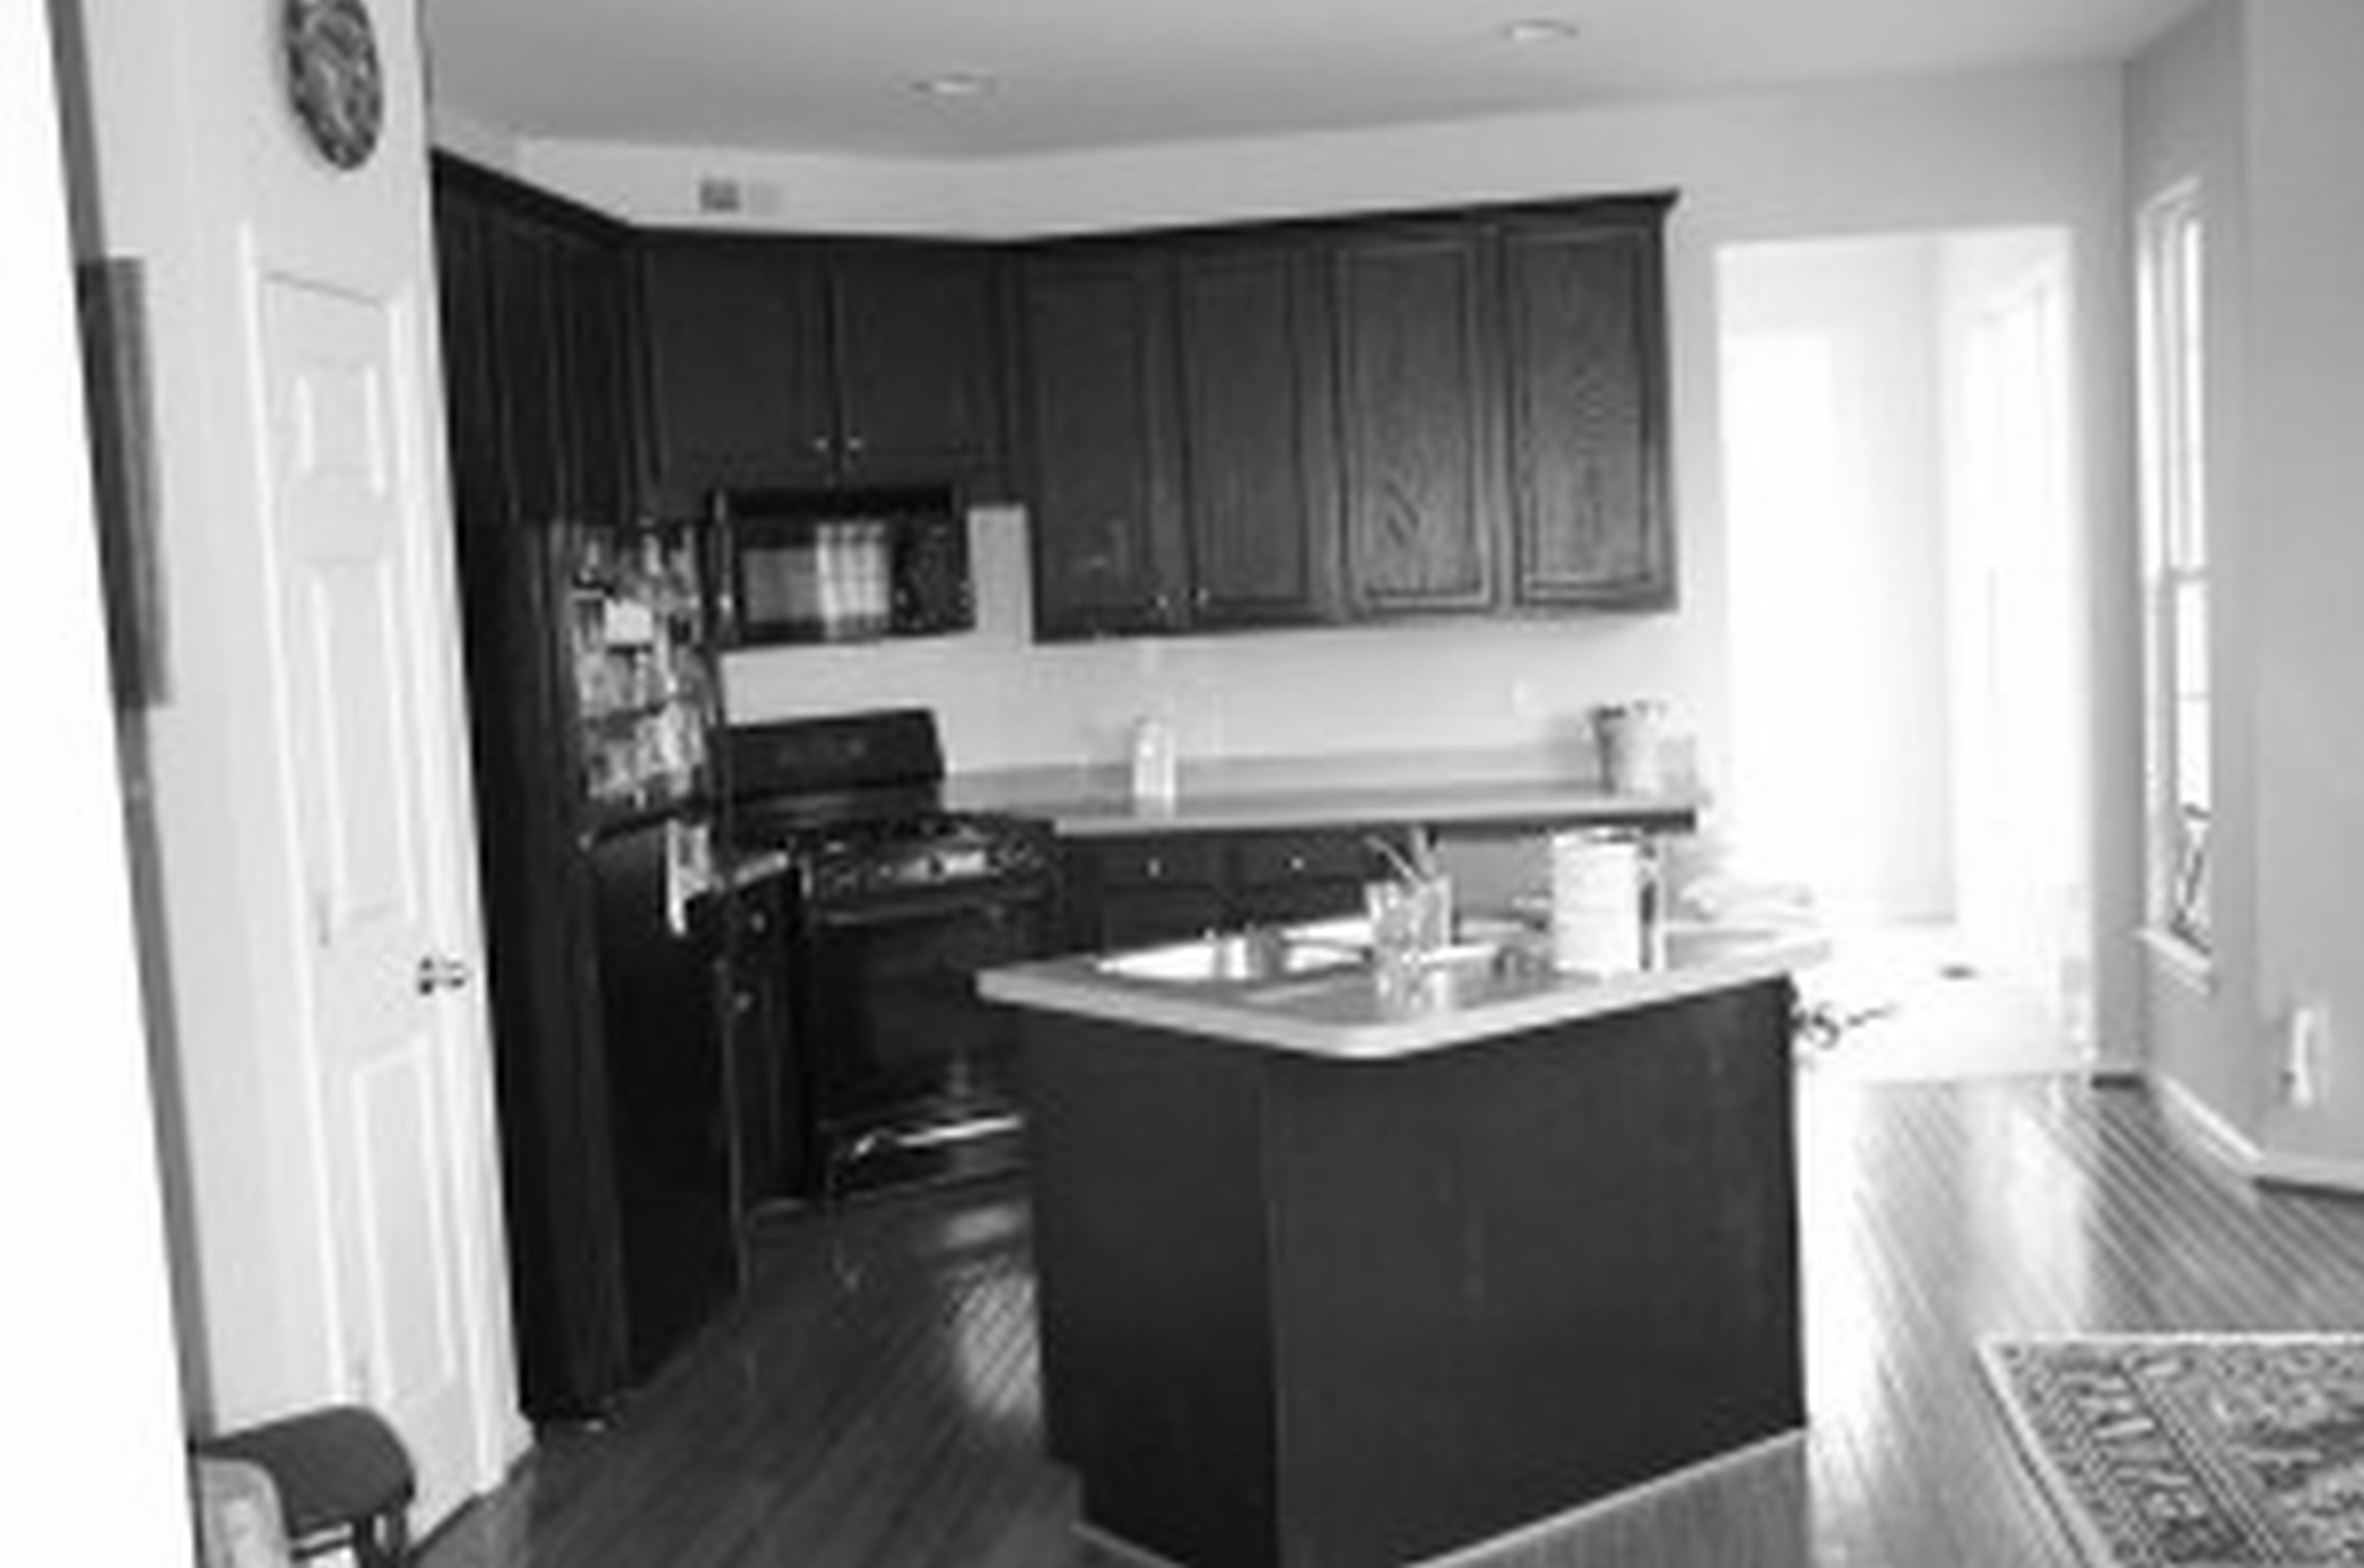 Kitchens with Dark Cabinets and Black Appliances black kitchen